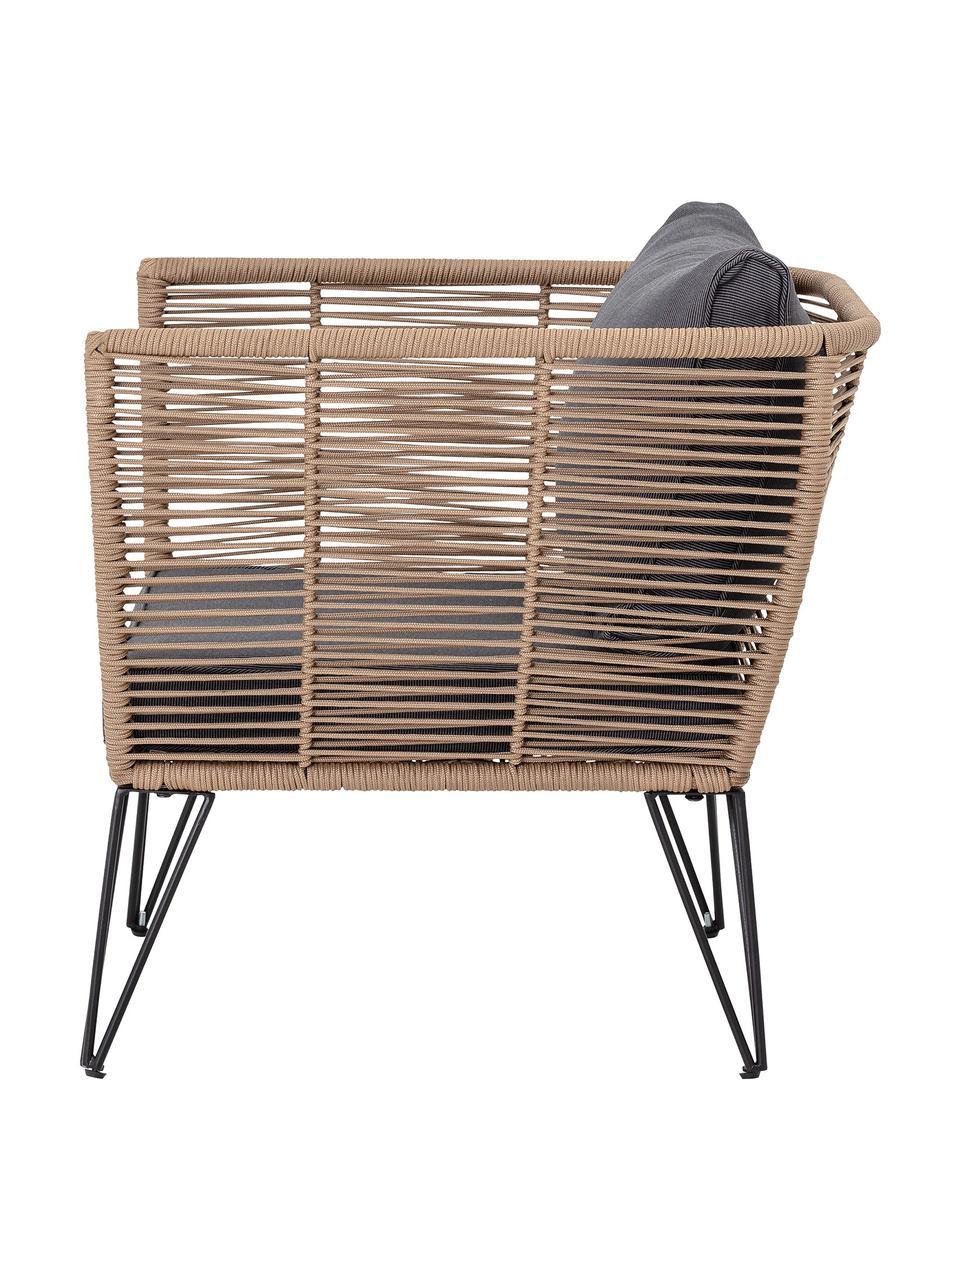 Garten-Loungesessel Mundo mit Kunststoff-Geflecht, Gestell: Metall, pulverbeschichtet, Sitzfläche: Polyethylen, Bezug: Polyester, Braun, B 87 x T 74 cm